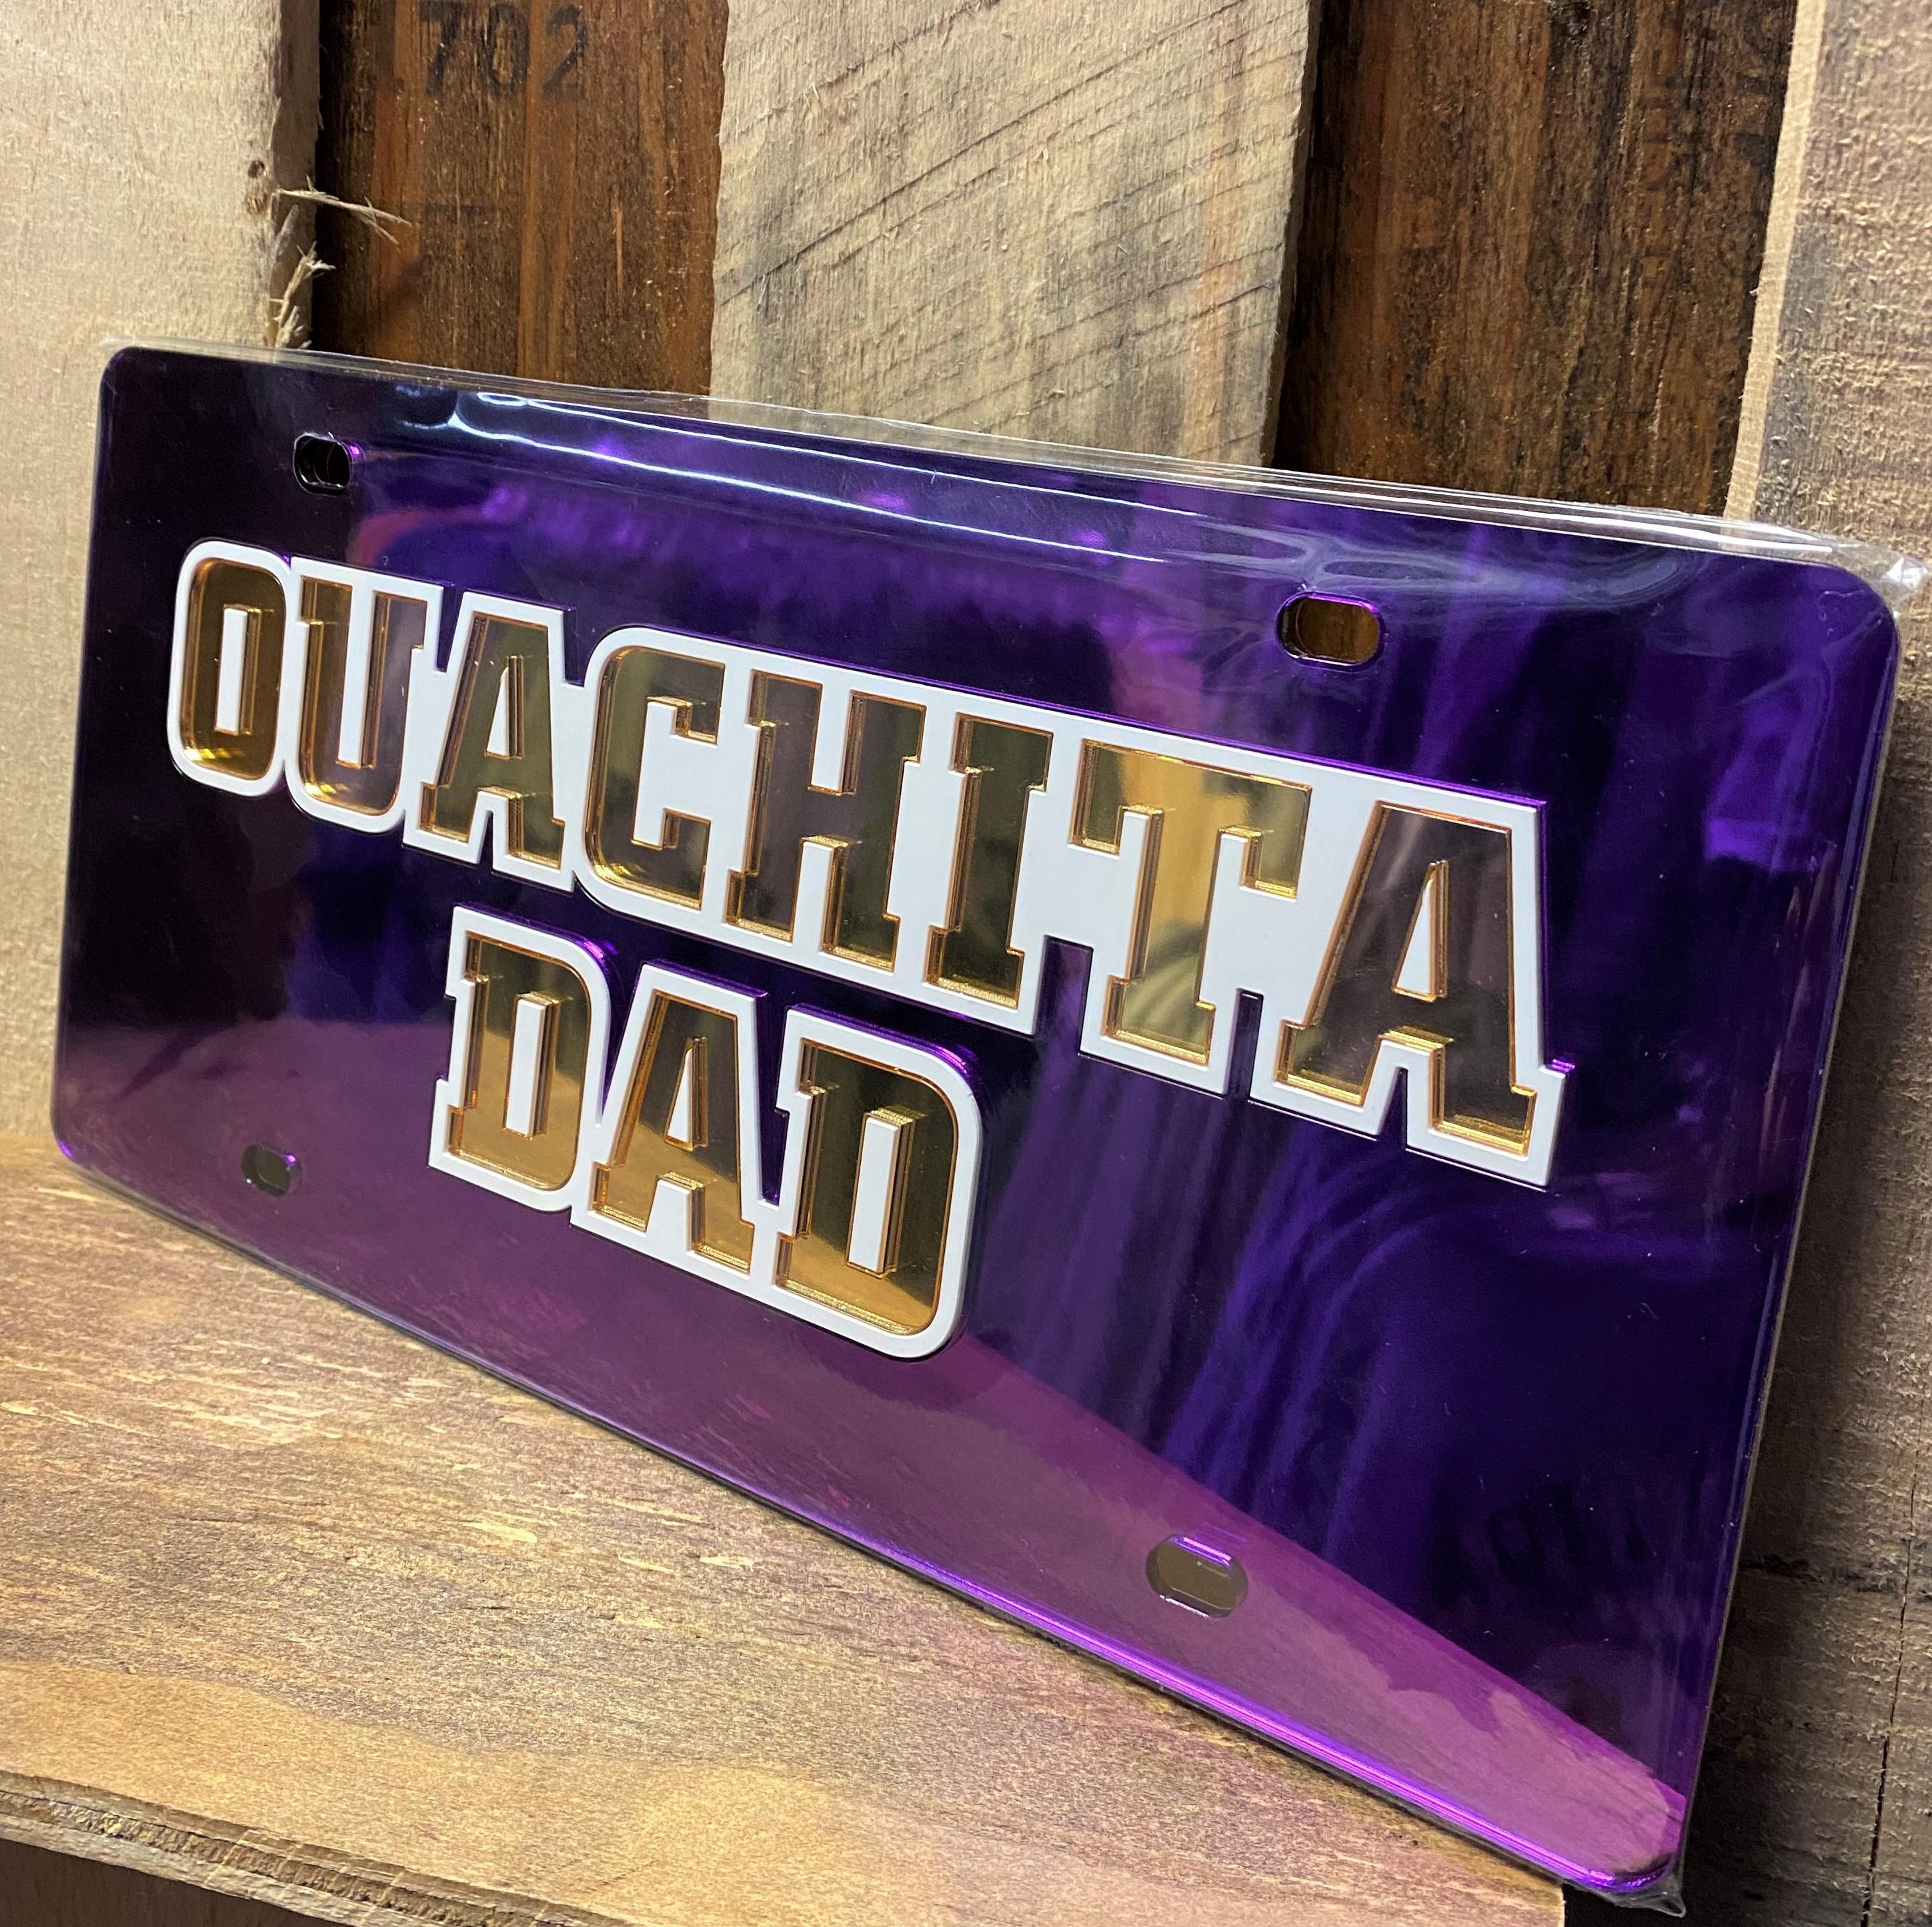 OUACHITA DAD LICENSE PLATE